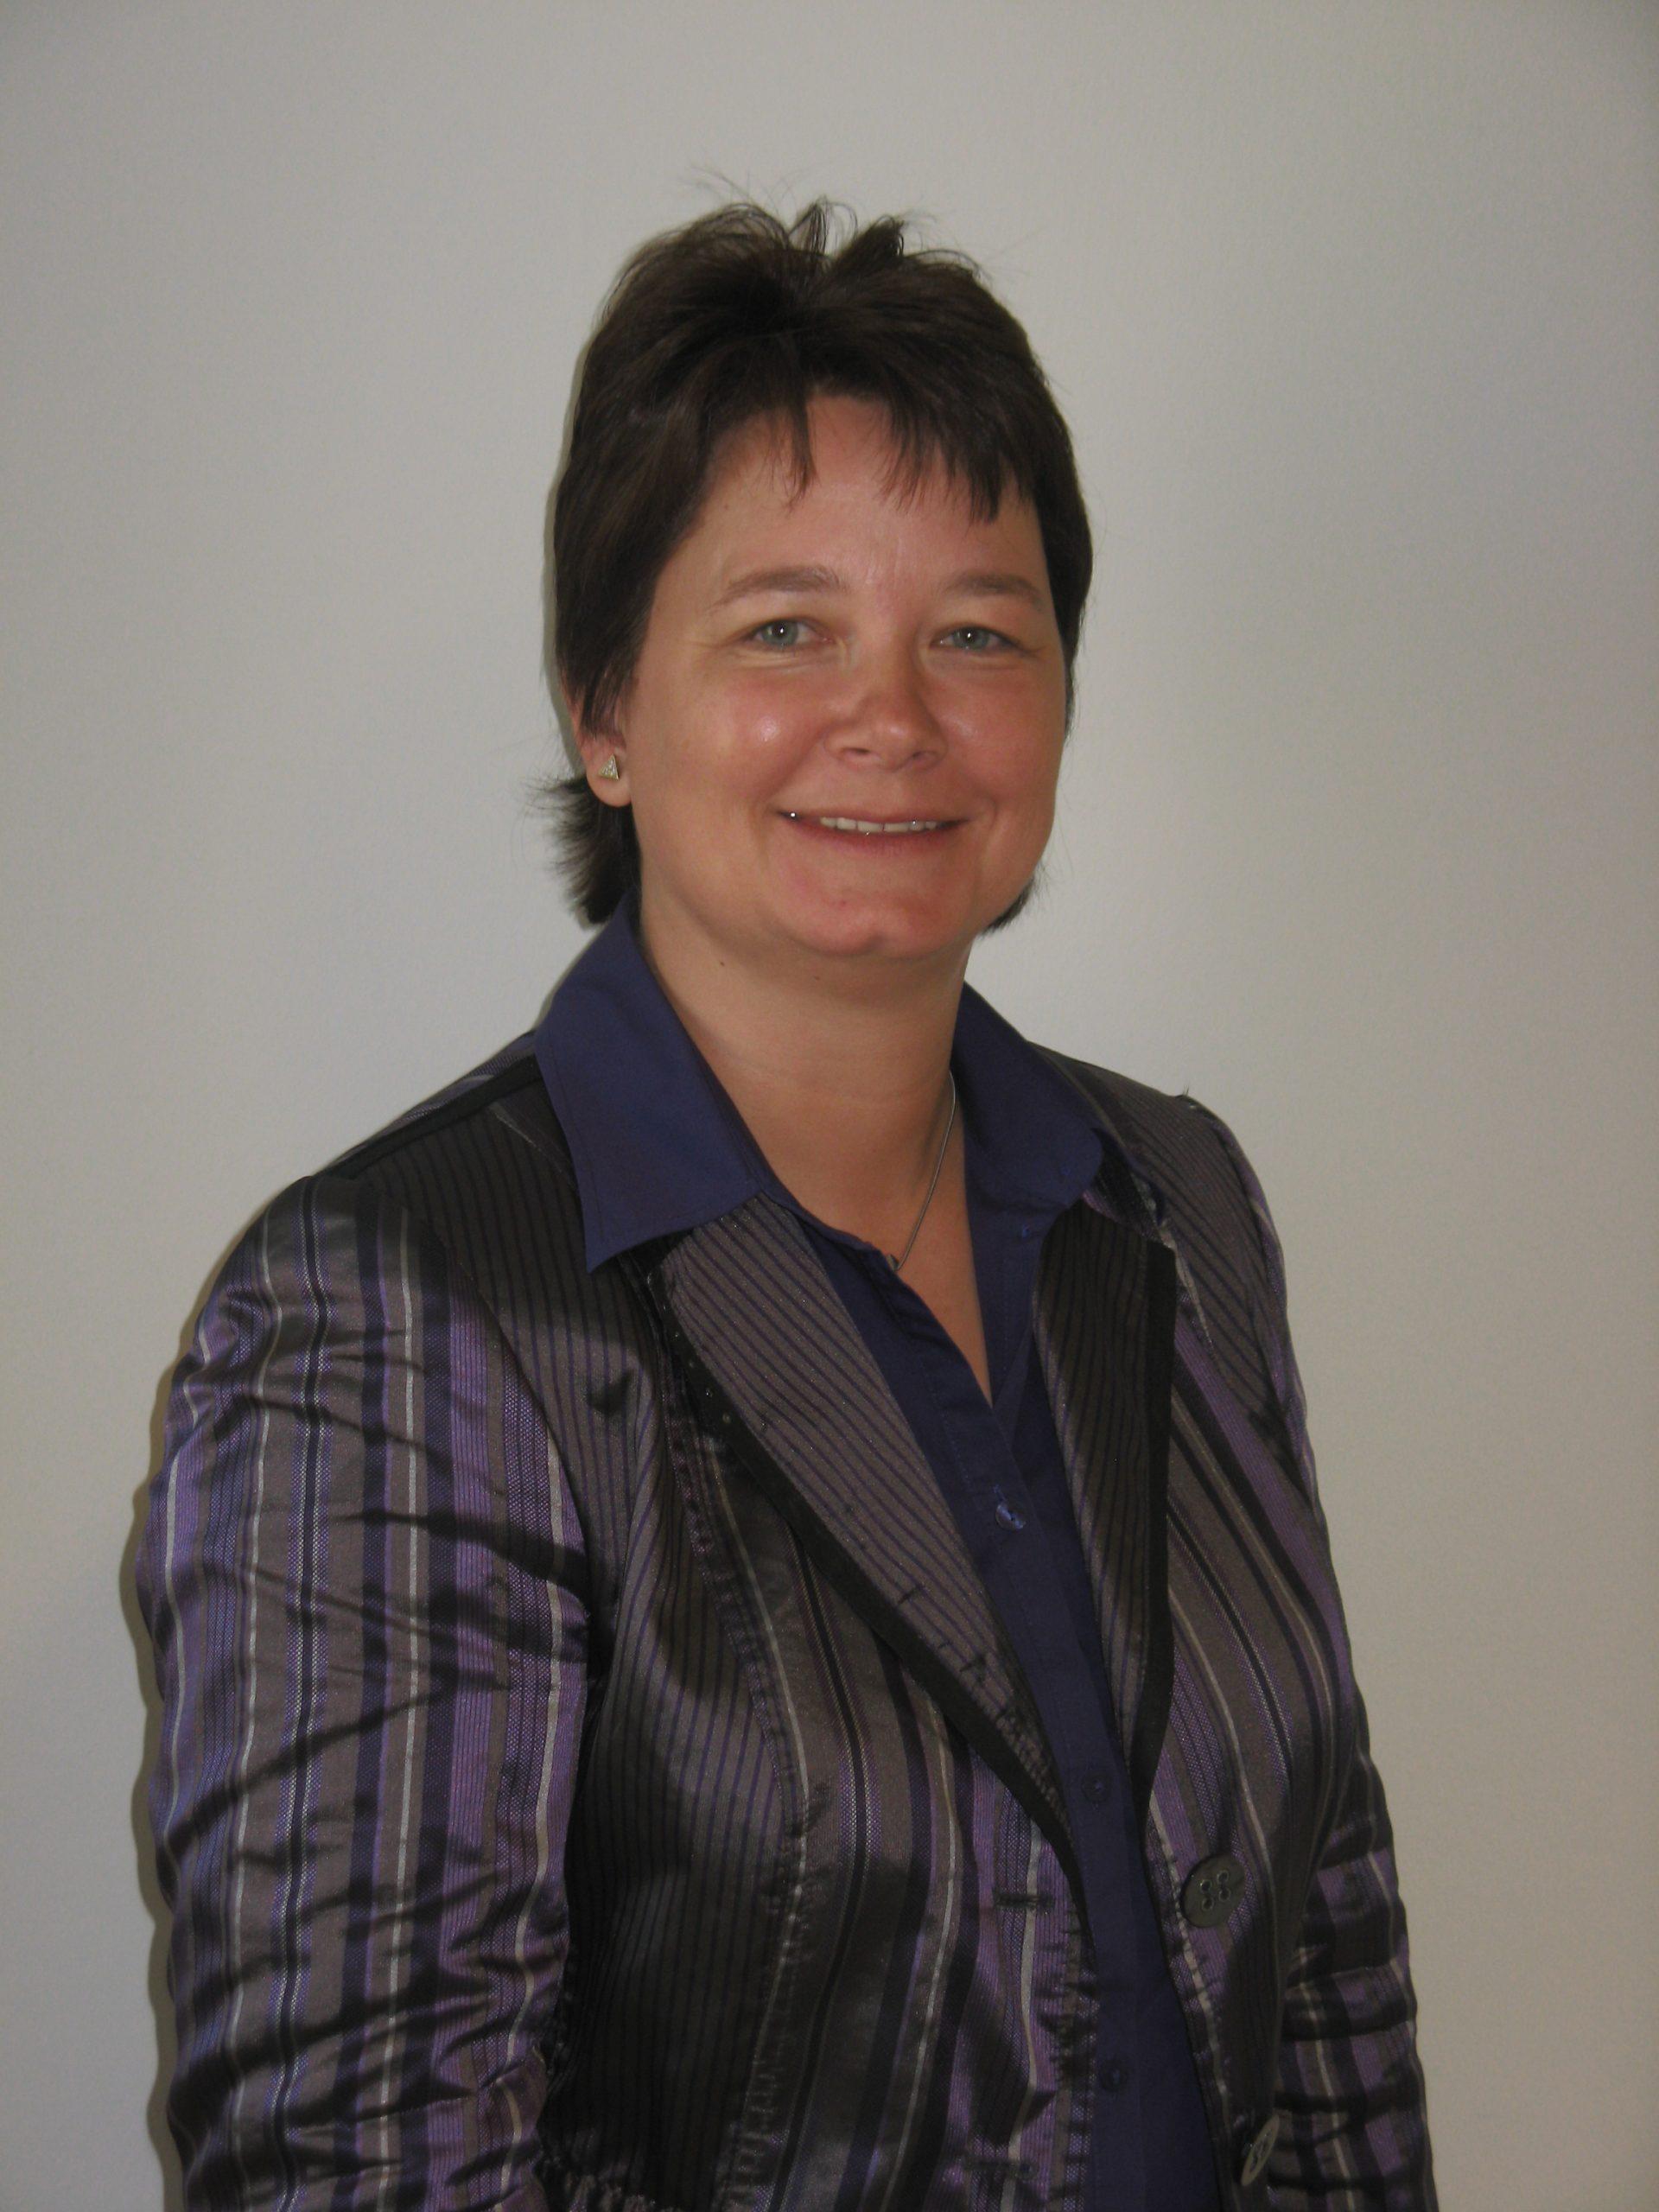 Foto: Vizepräsidentin Ursula Leutl